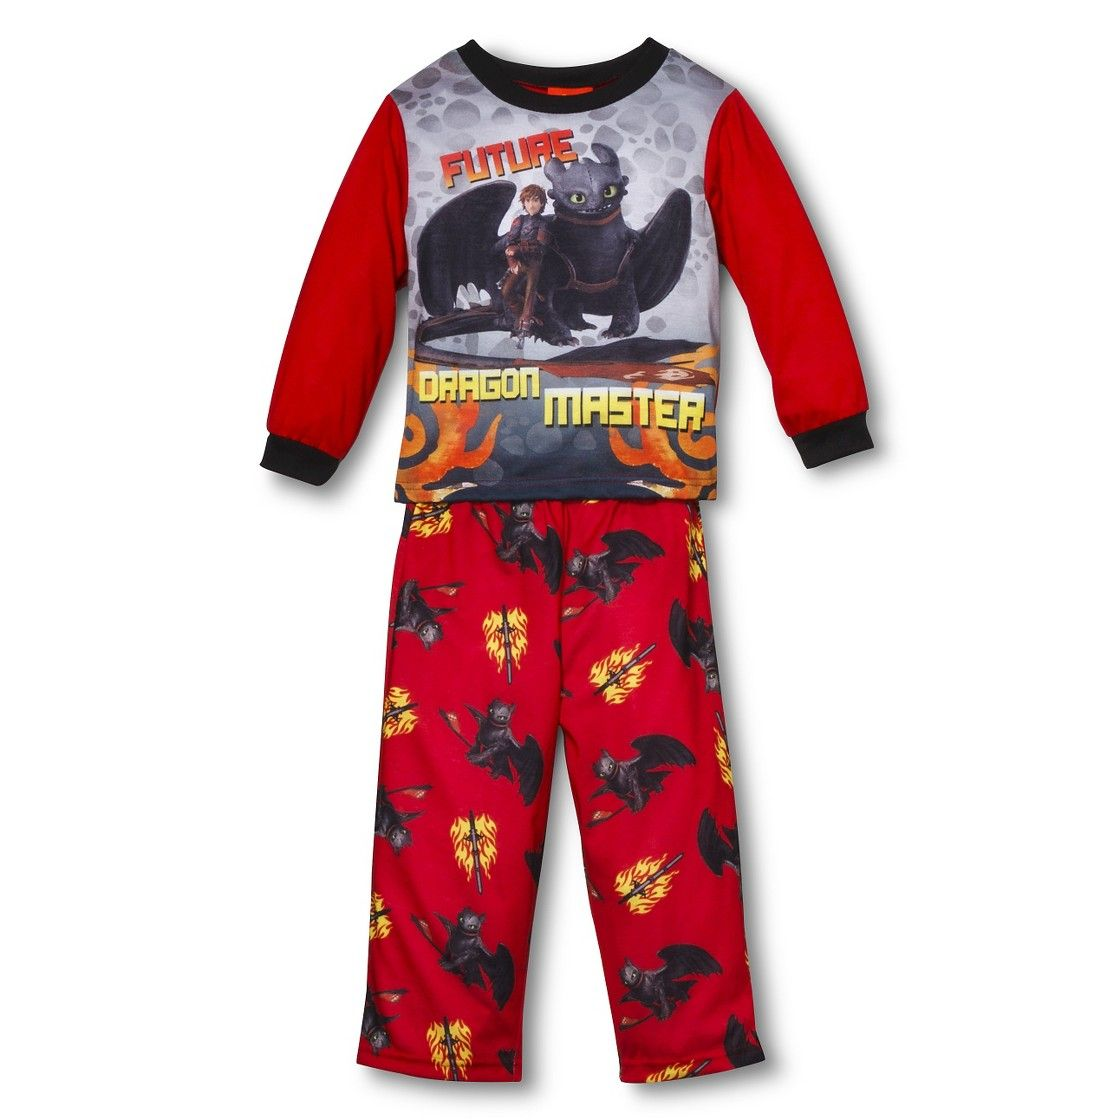 How To Train Your Dragon Toddler Boys 2 Piece Sleep Set